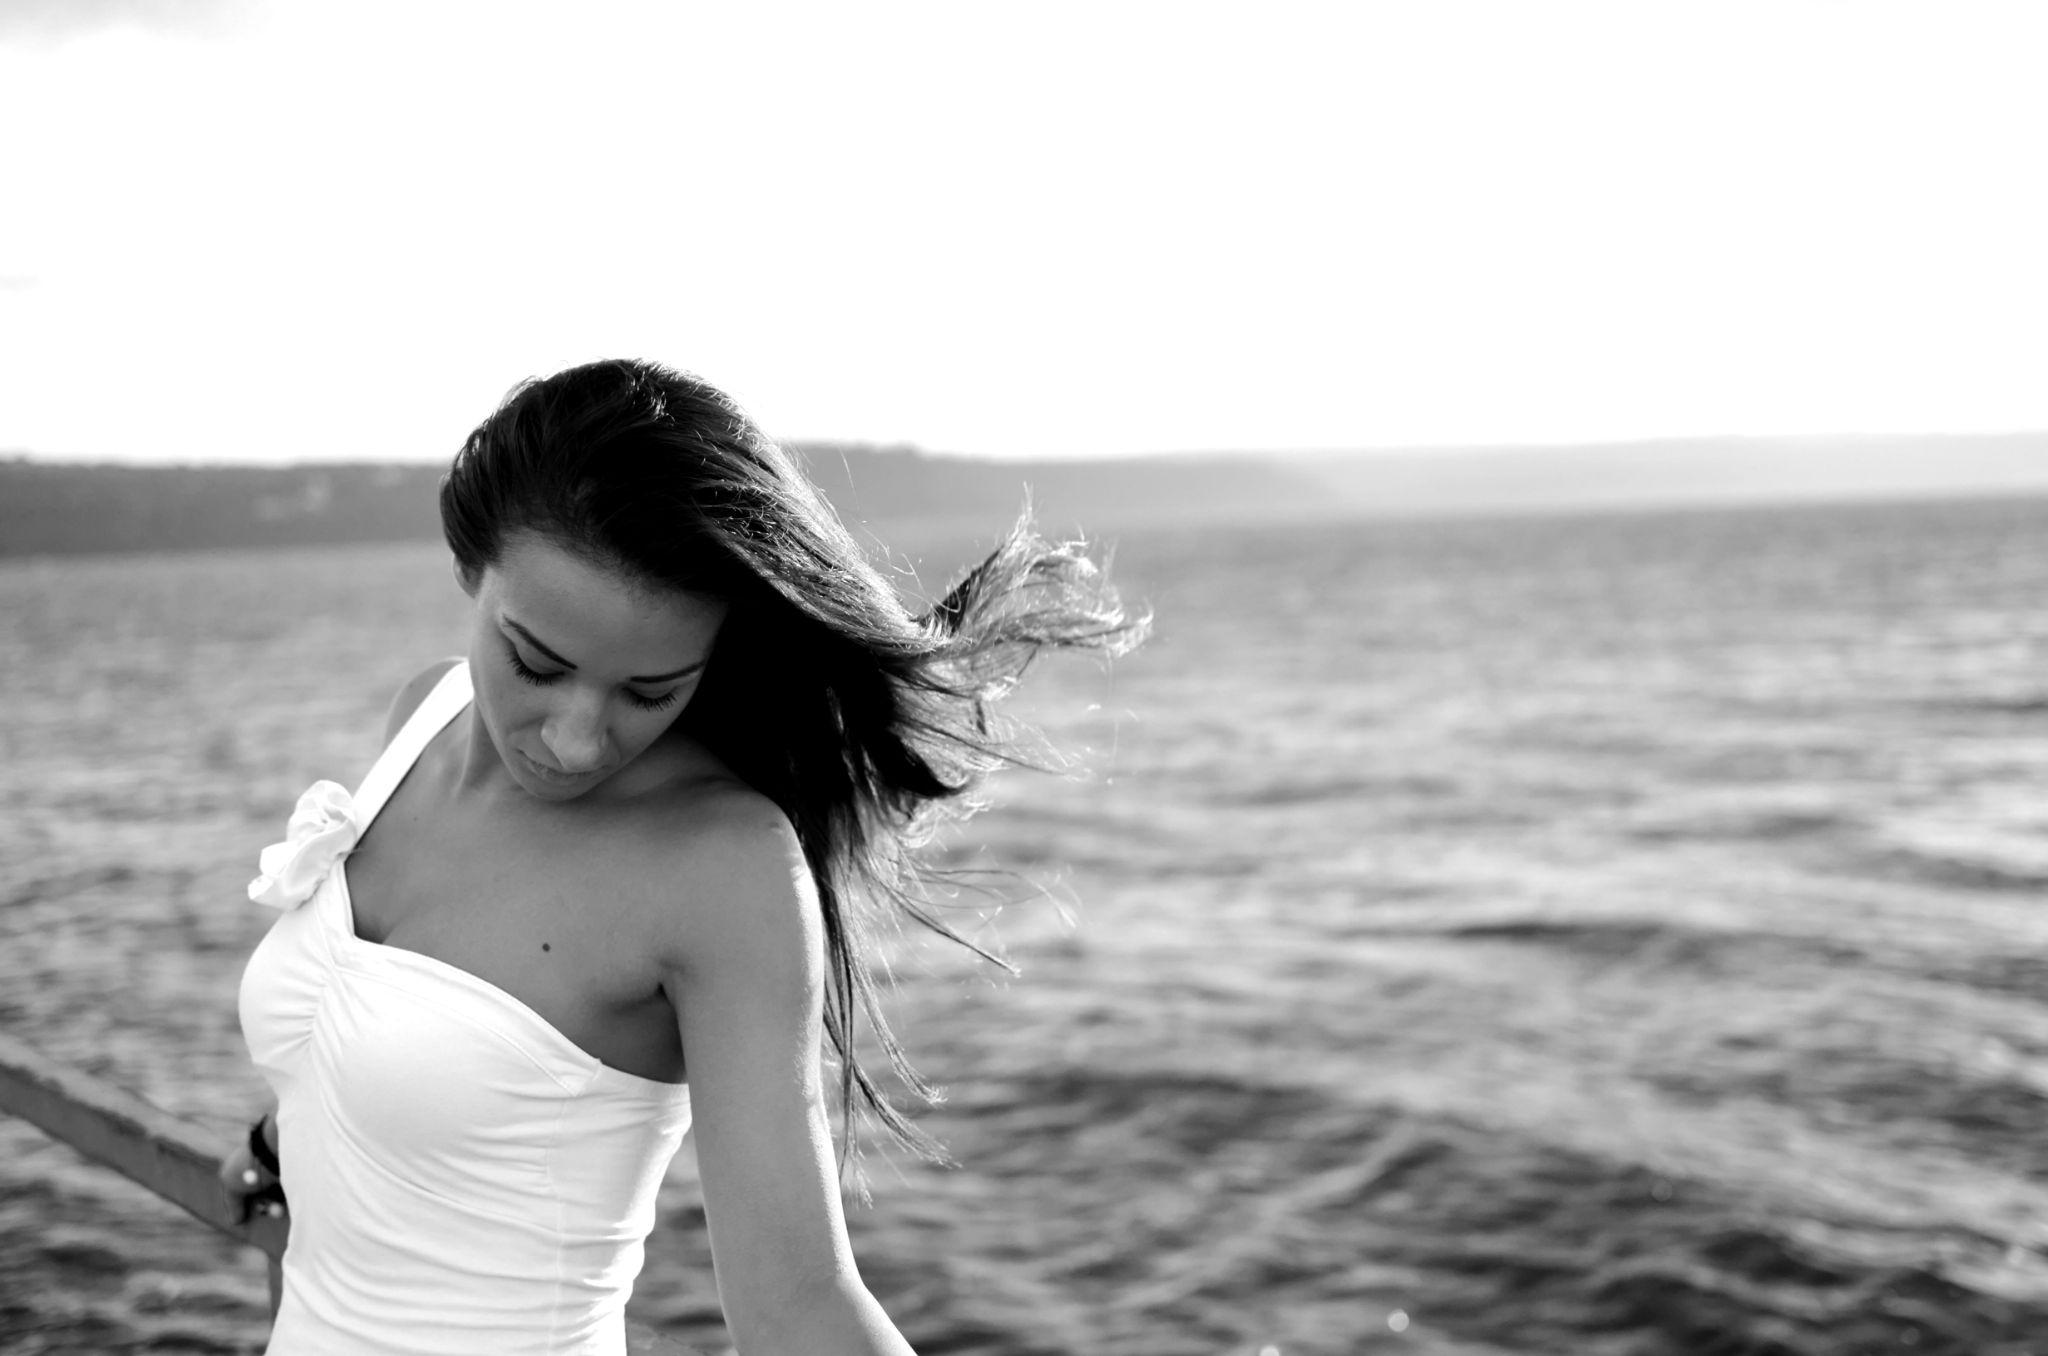 Soledad by ekaterina.moneva